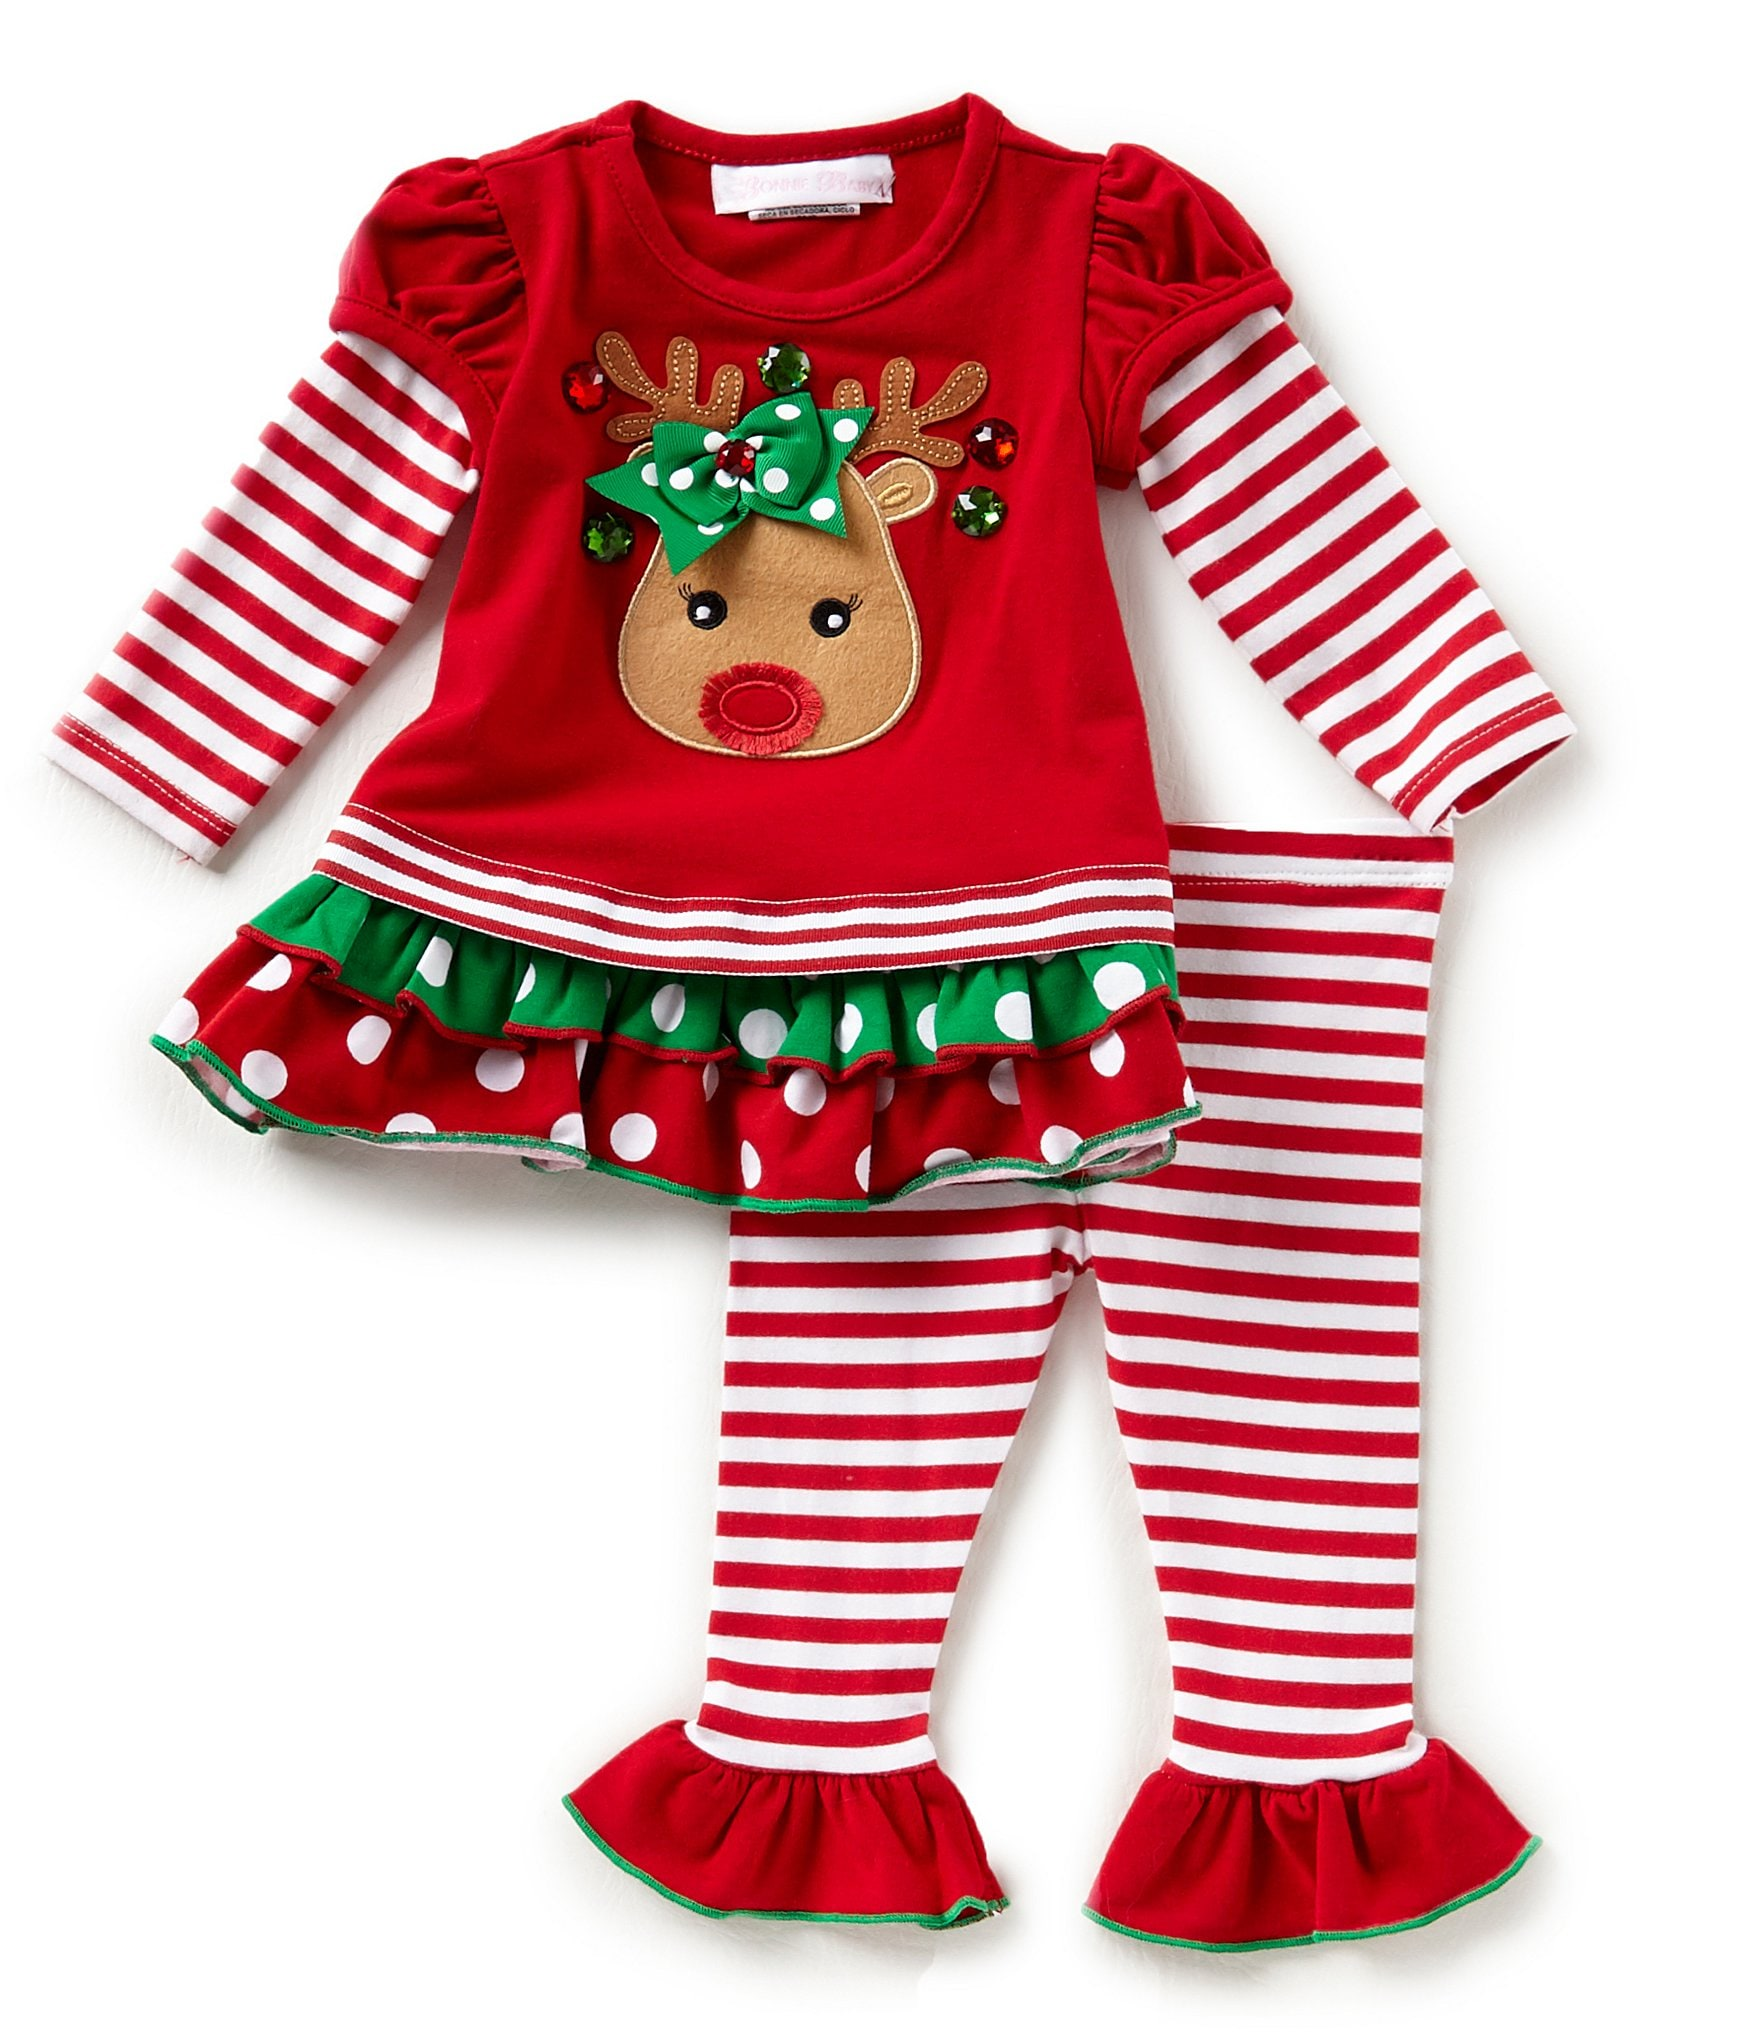 Bonnie Baby Baby Girls Newborn 24 Months Christmas Mixed